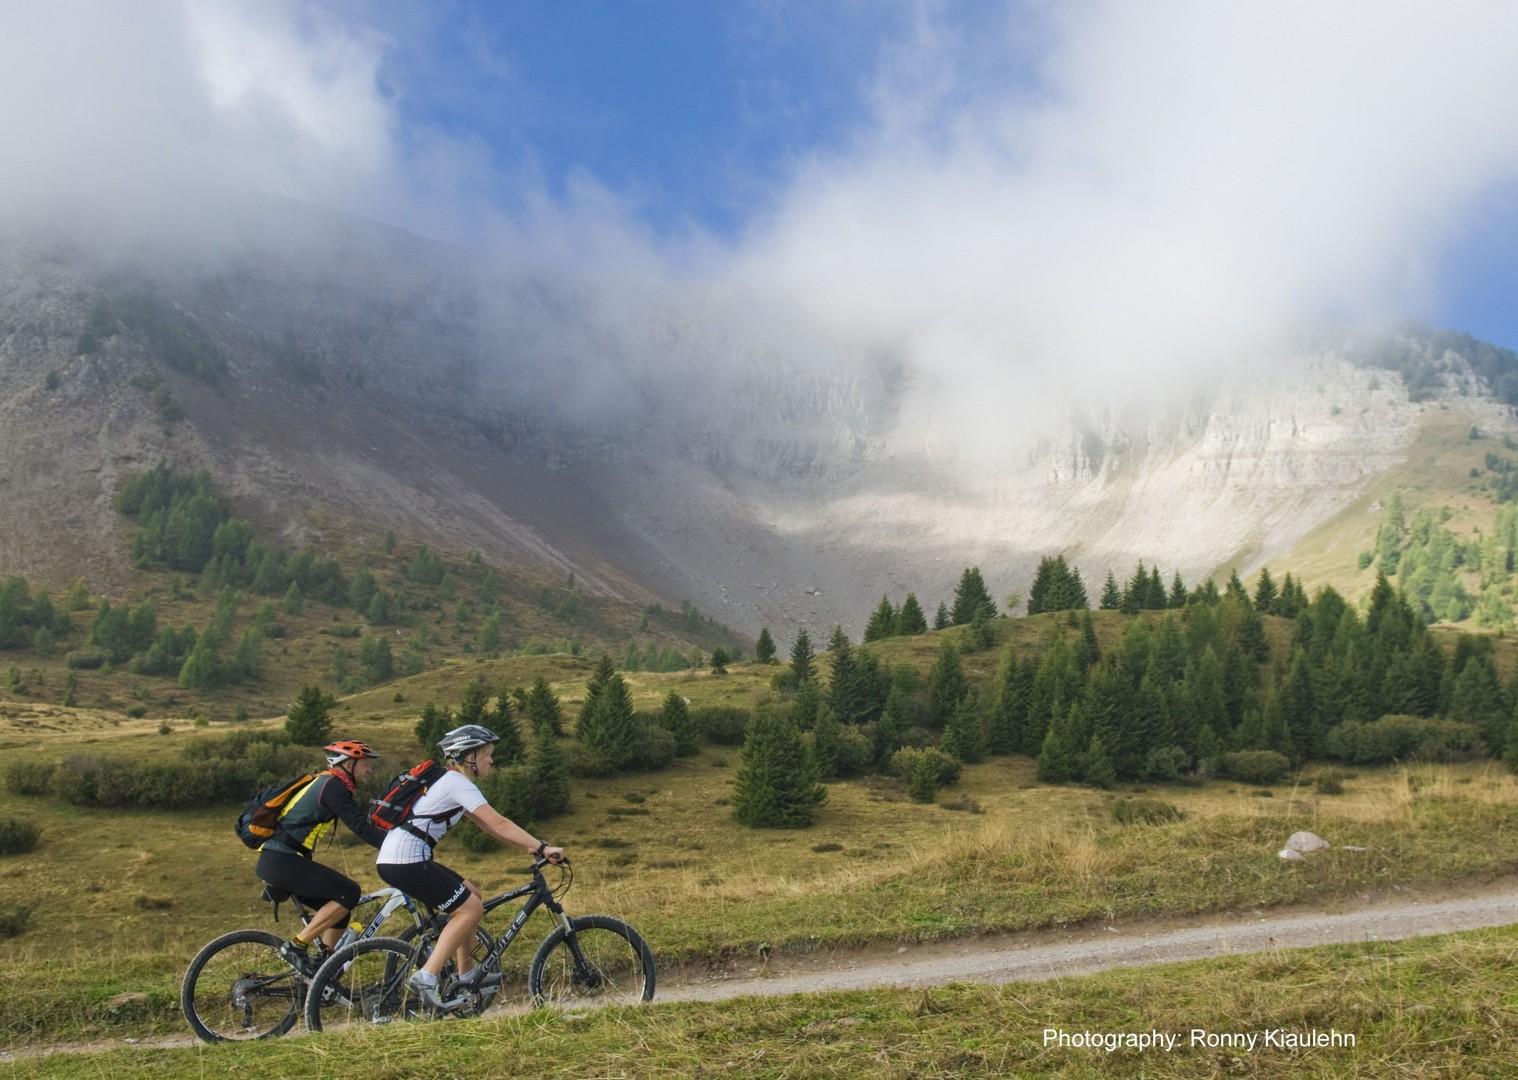 dolomites3.jpg - Italy - Dolomites of Brenta - Guided Mountain Bike Holiday - Mountain Biking